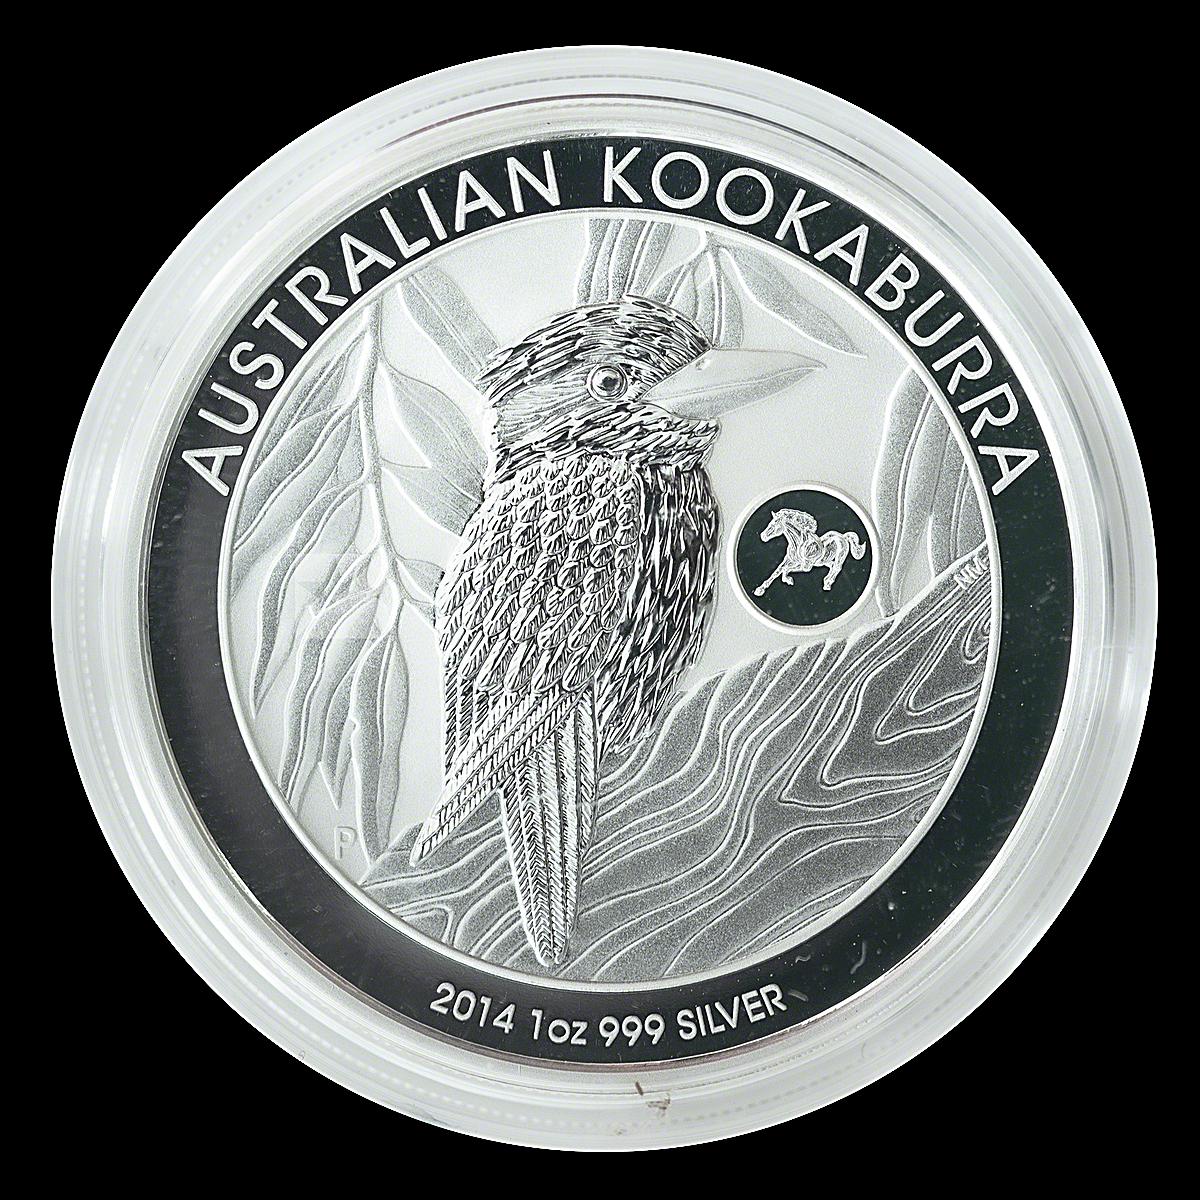 Australian Silver Kookaburra 2014